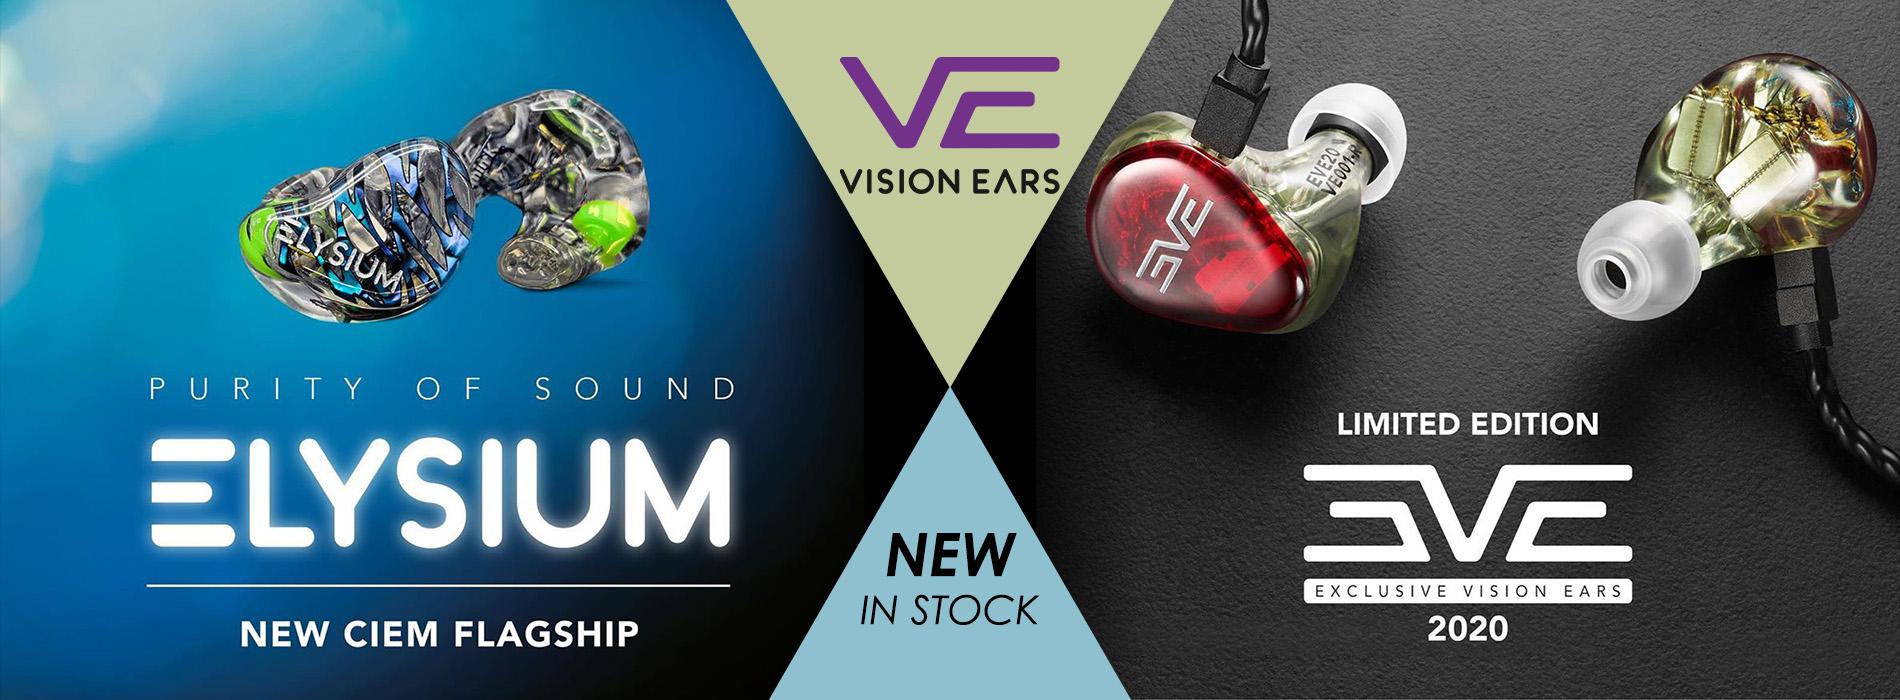 vision ears elysium eve20 banner large.jpg